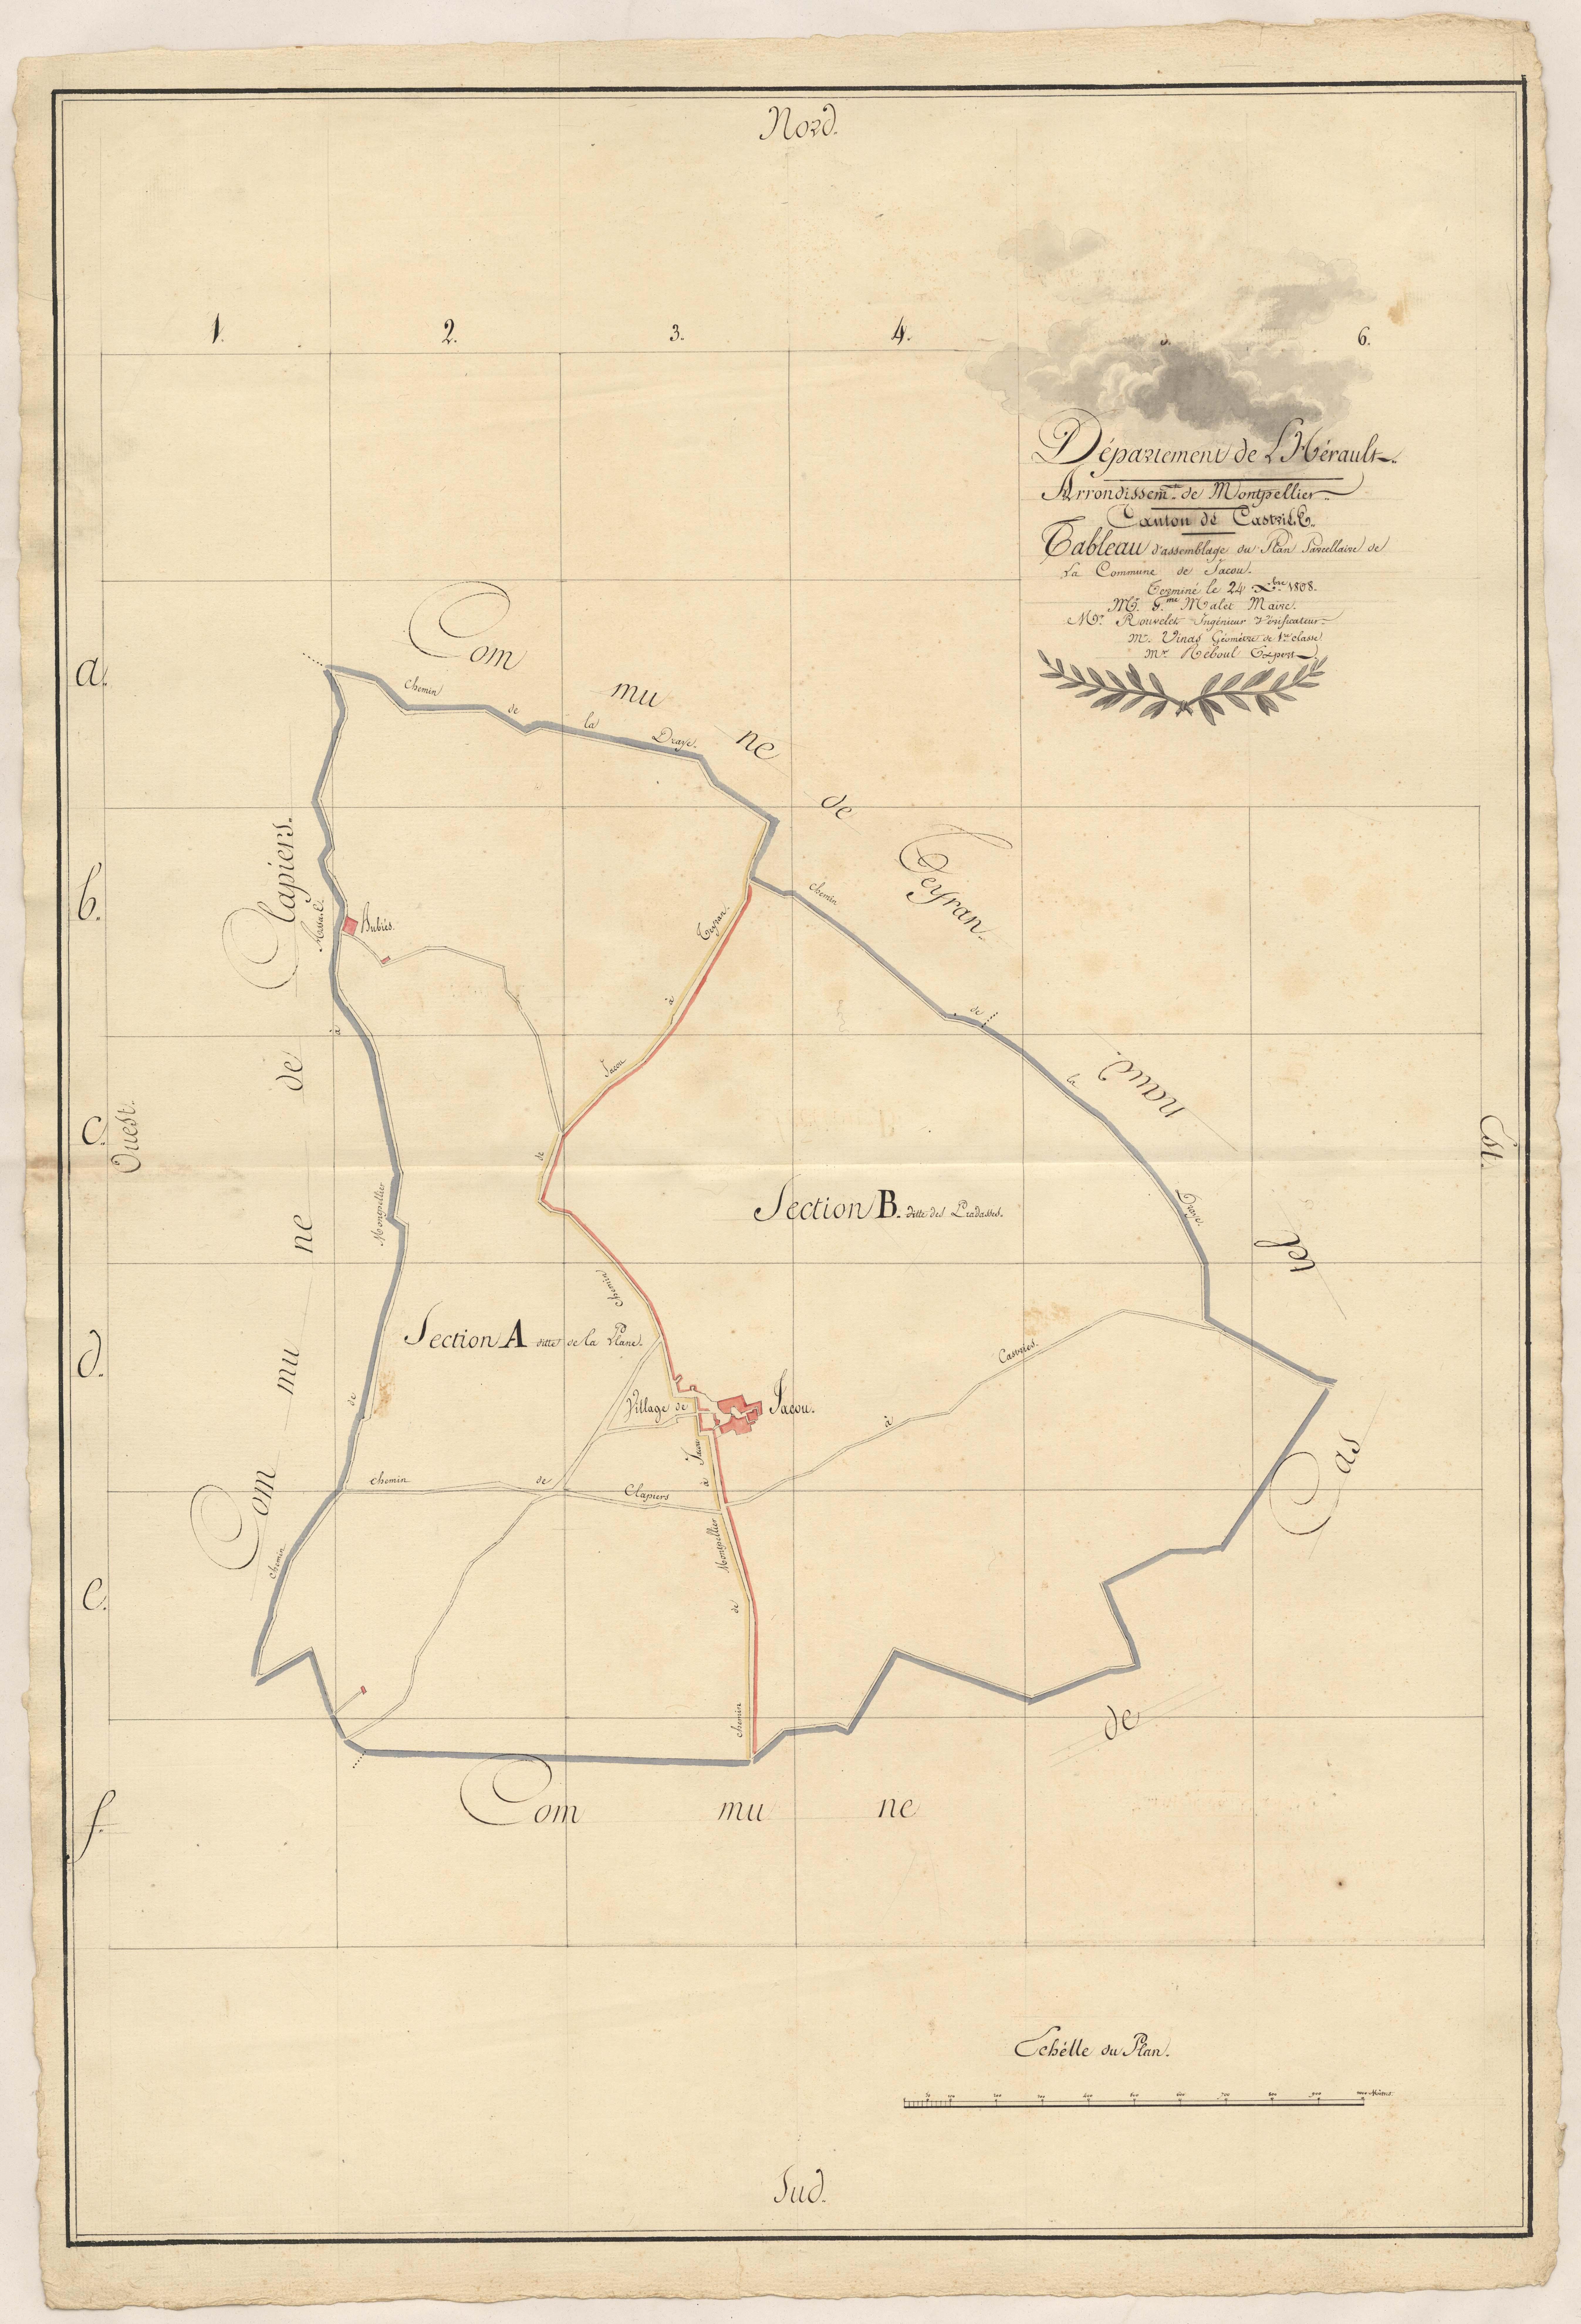 image 1808_plan_dassemblage_cadastre_Jacou_Archives_dpartementales_Hrault.jpg (2.3MB)